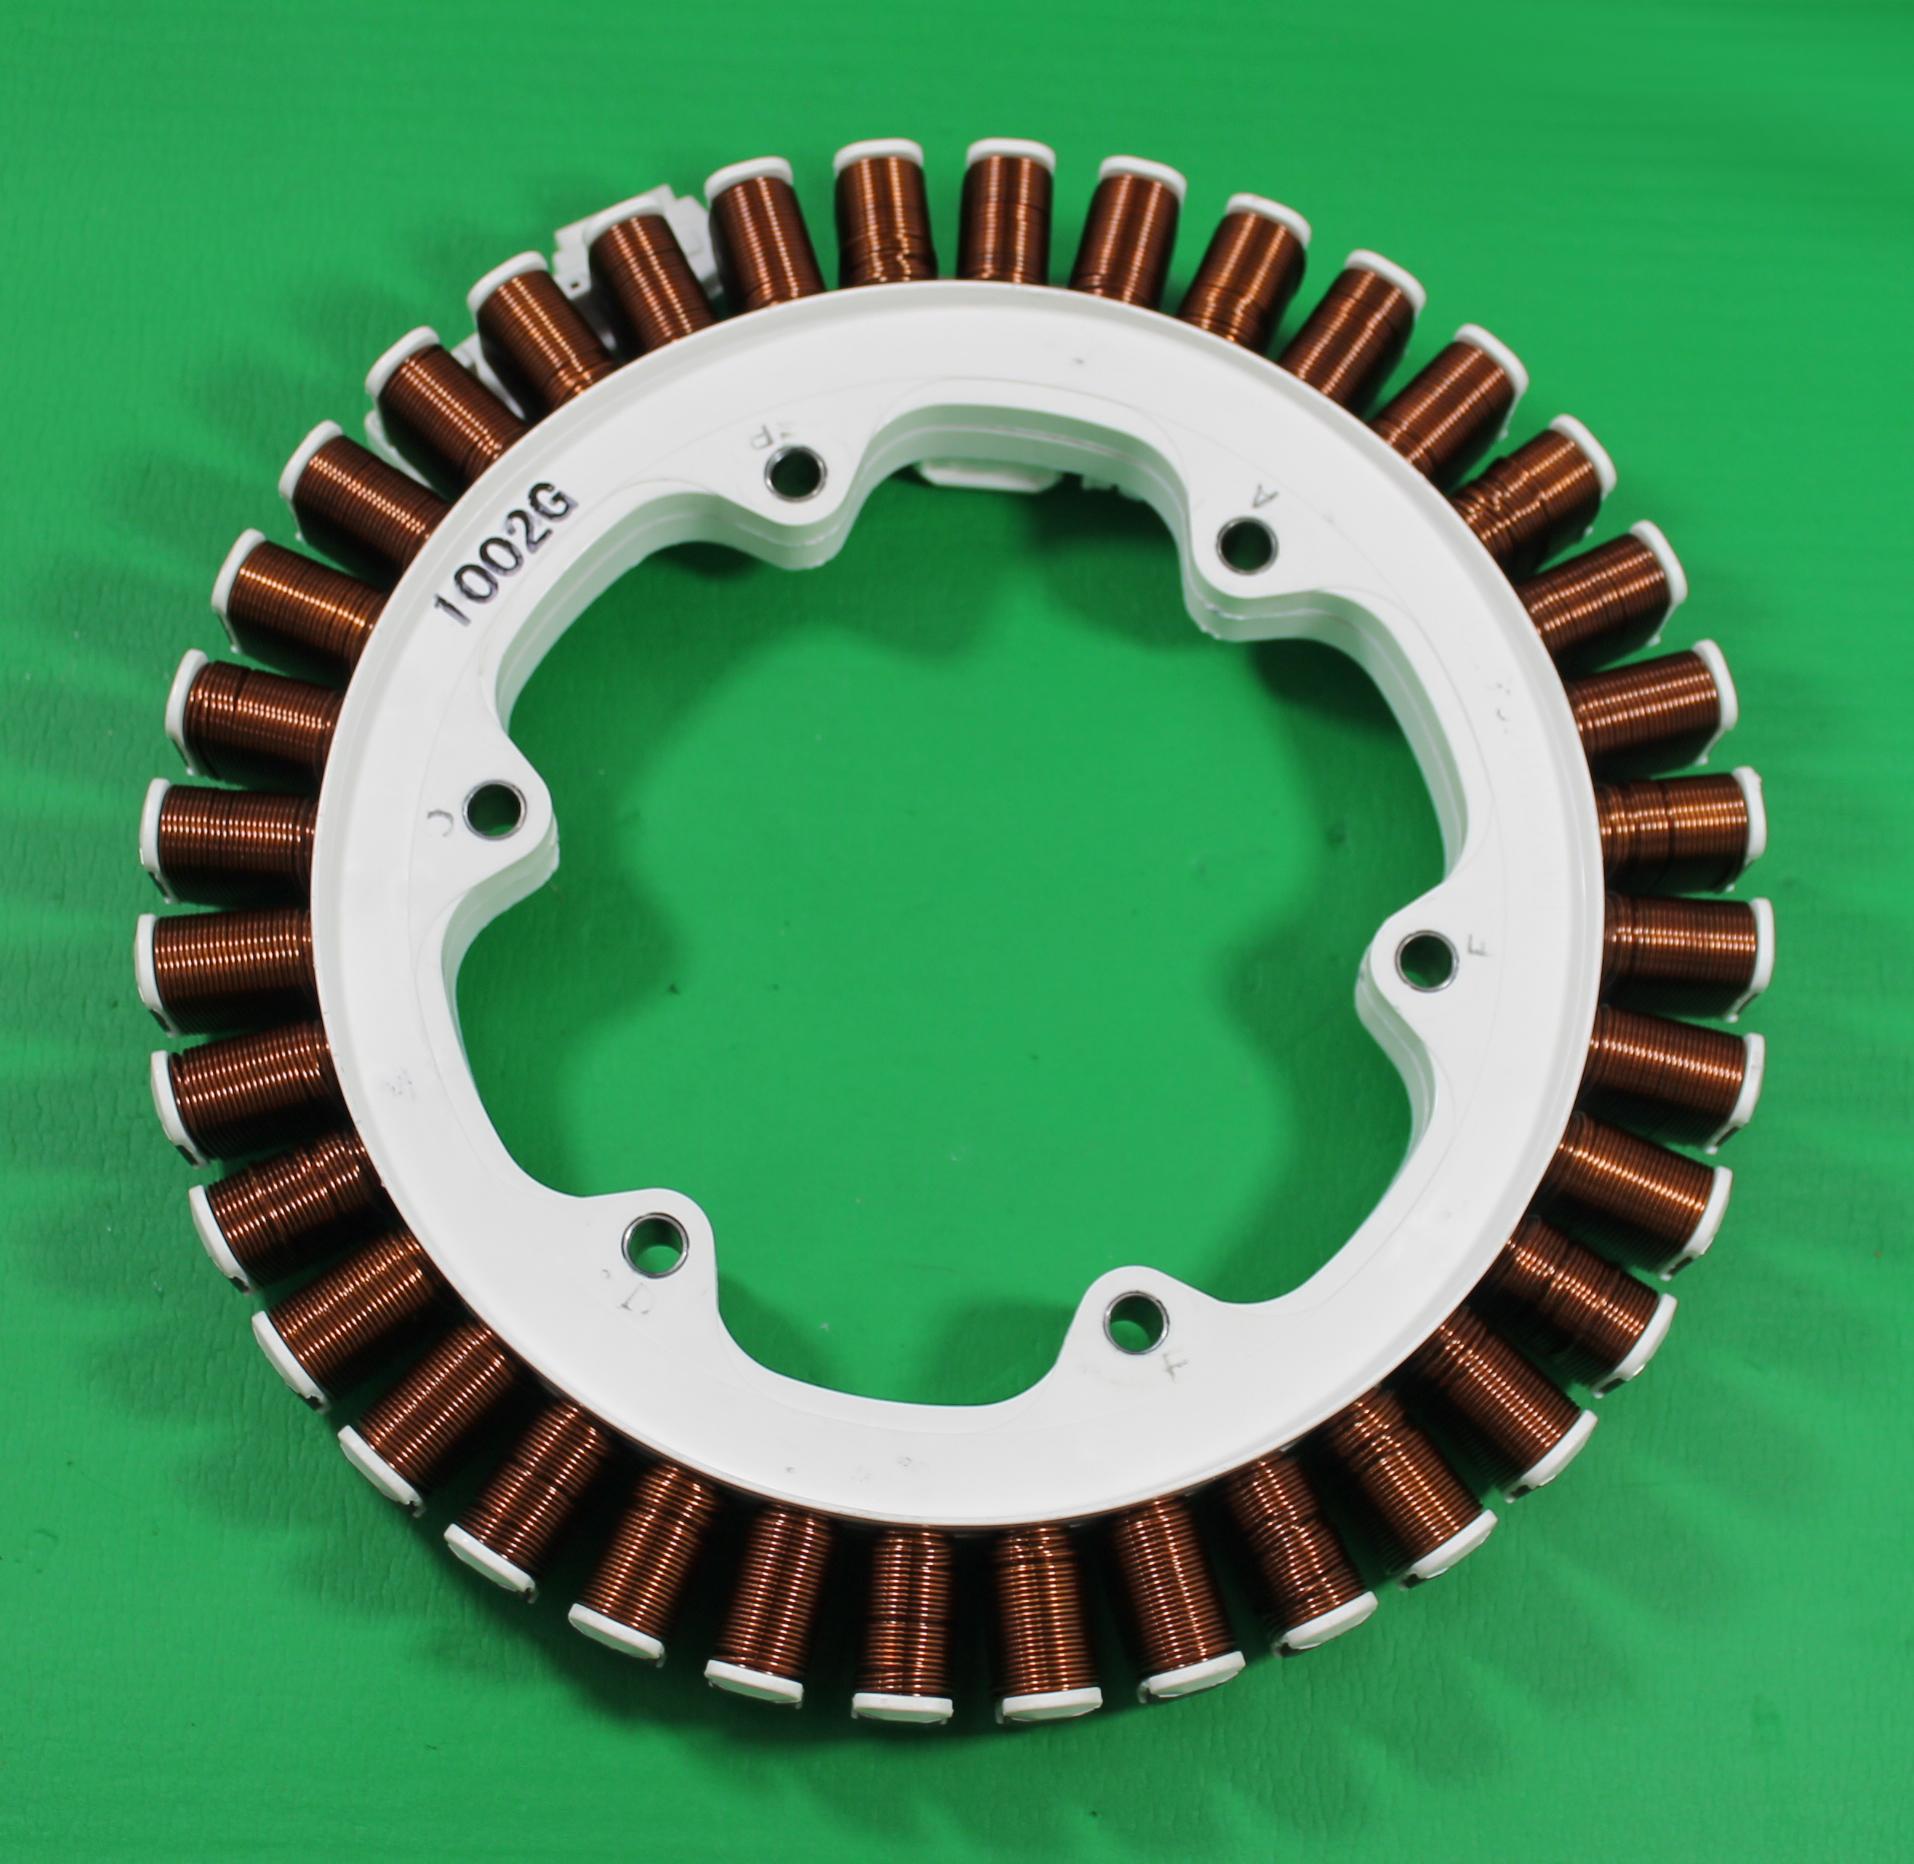 Lg f1496tda washing machine direct drive rotor stator for Washing machine drive motor